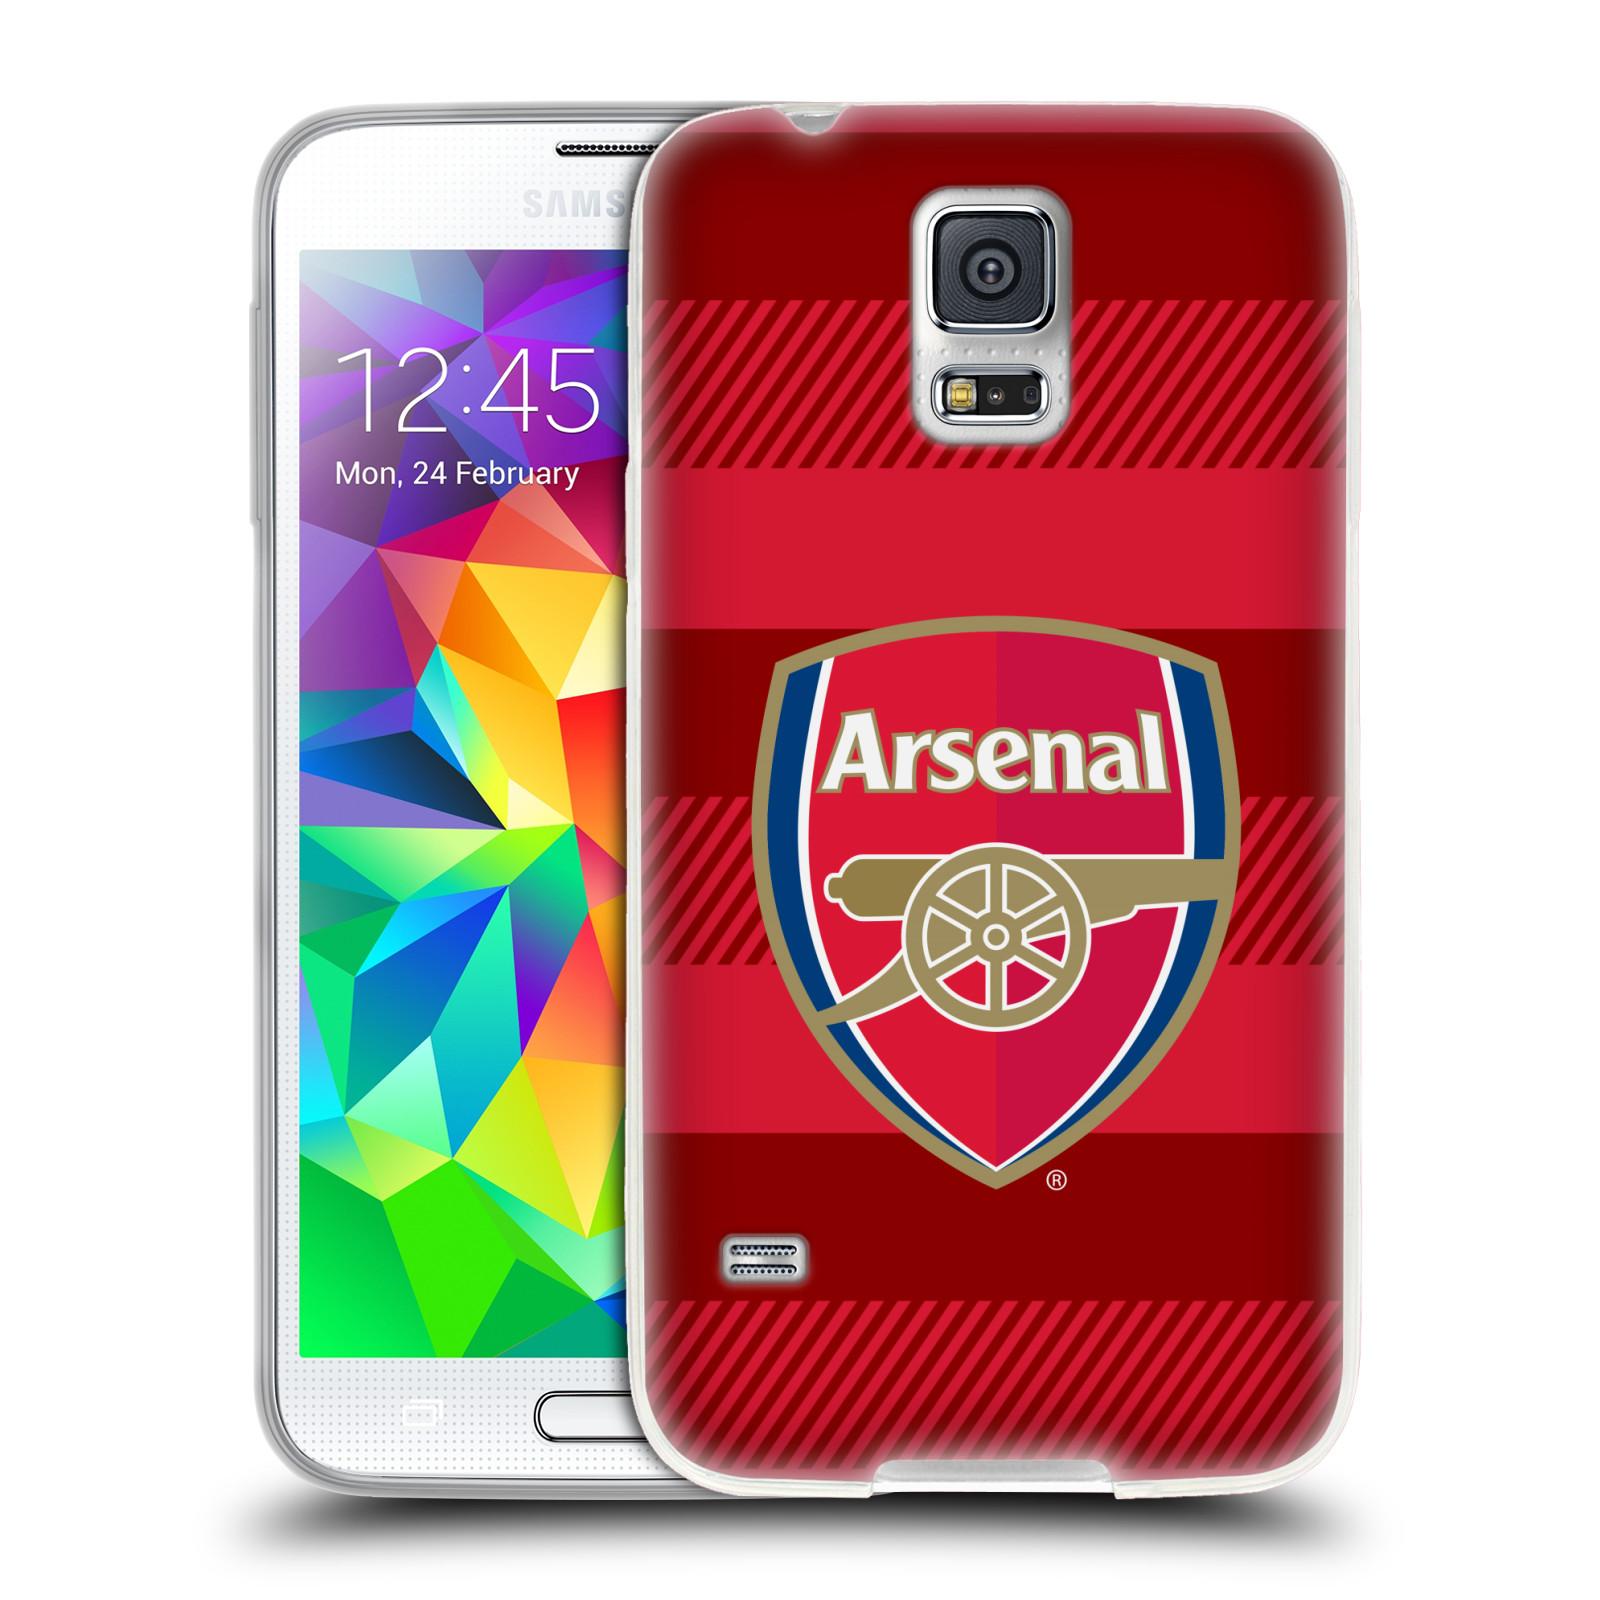 Silikonové pouzdro na mobil Samsung Galaxy S5 Neo - Head Case - Arsenal FC - Logo s pruhy